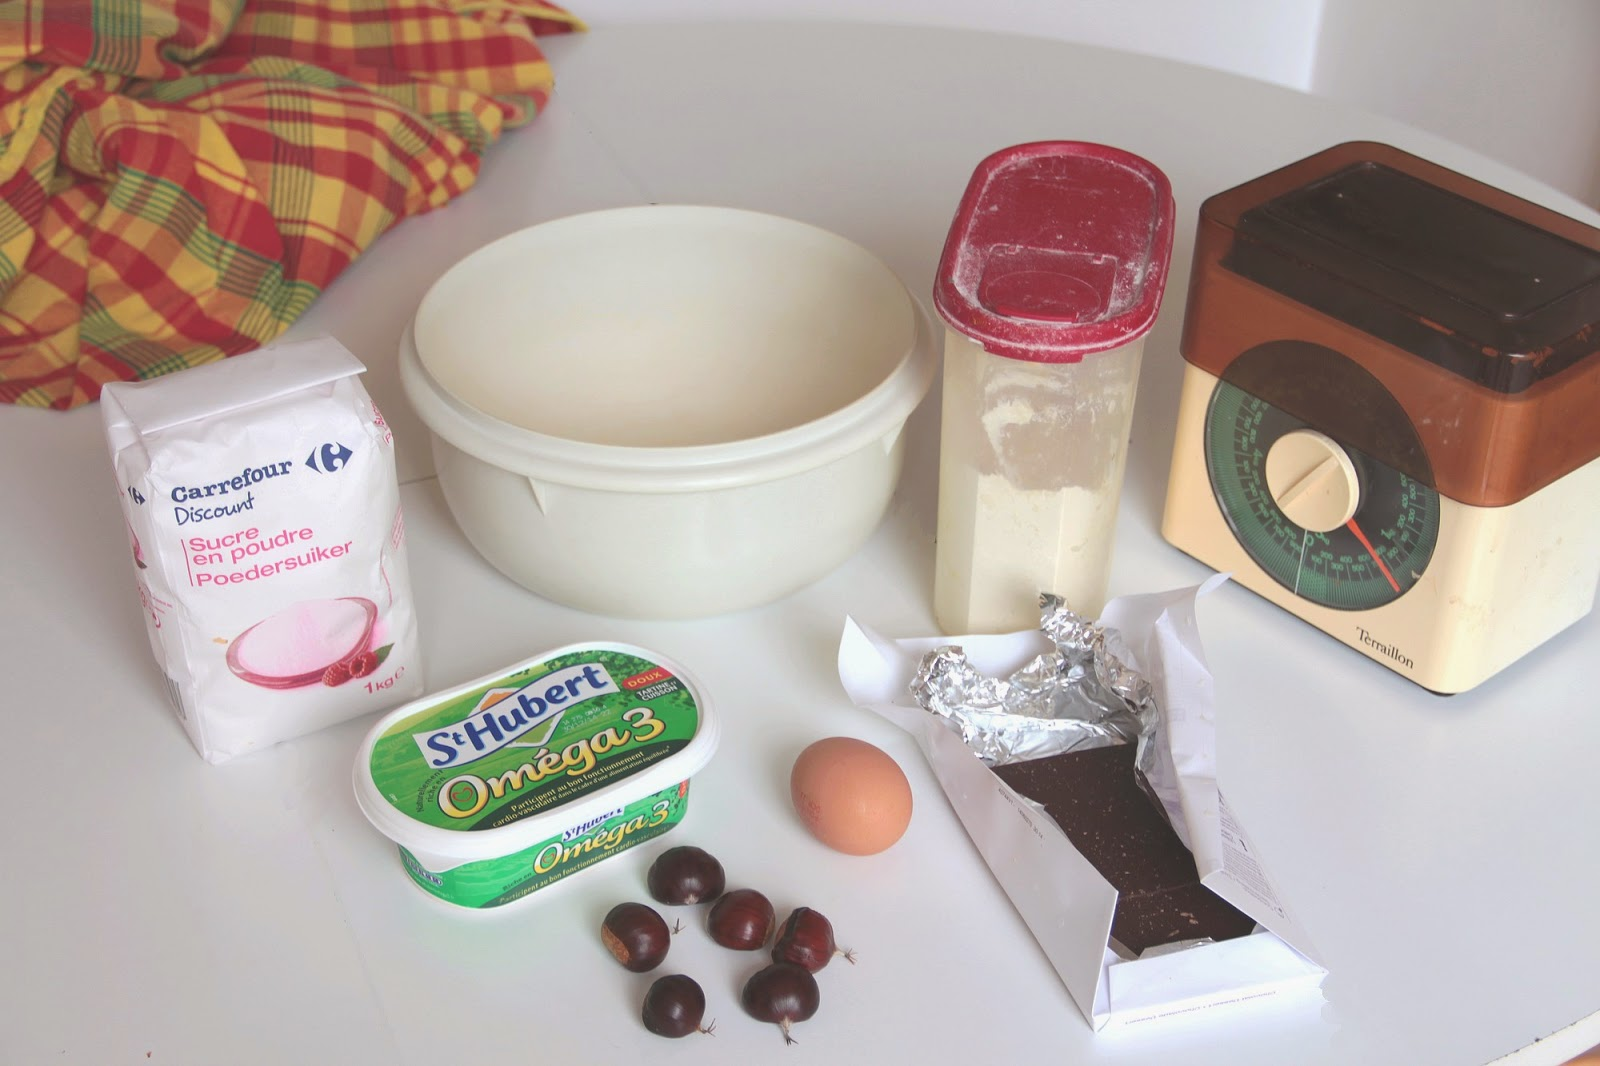 farine, sucre, balance, oeuf, chataigne, chocolat